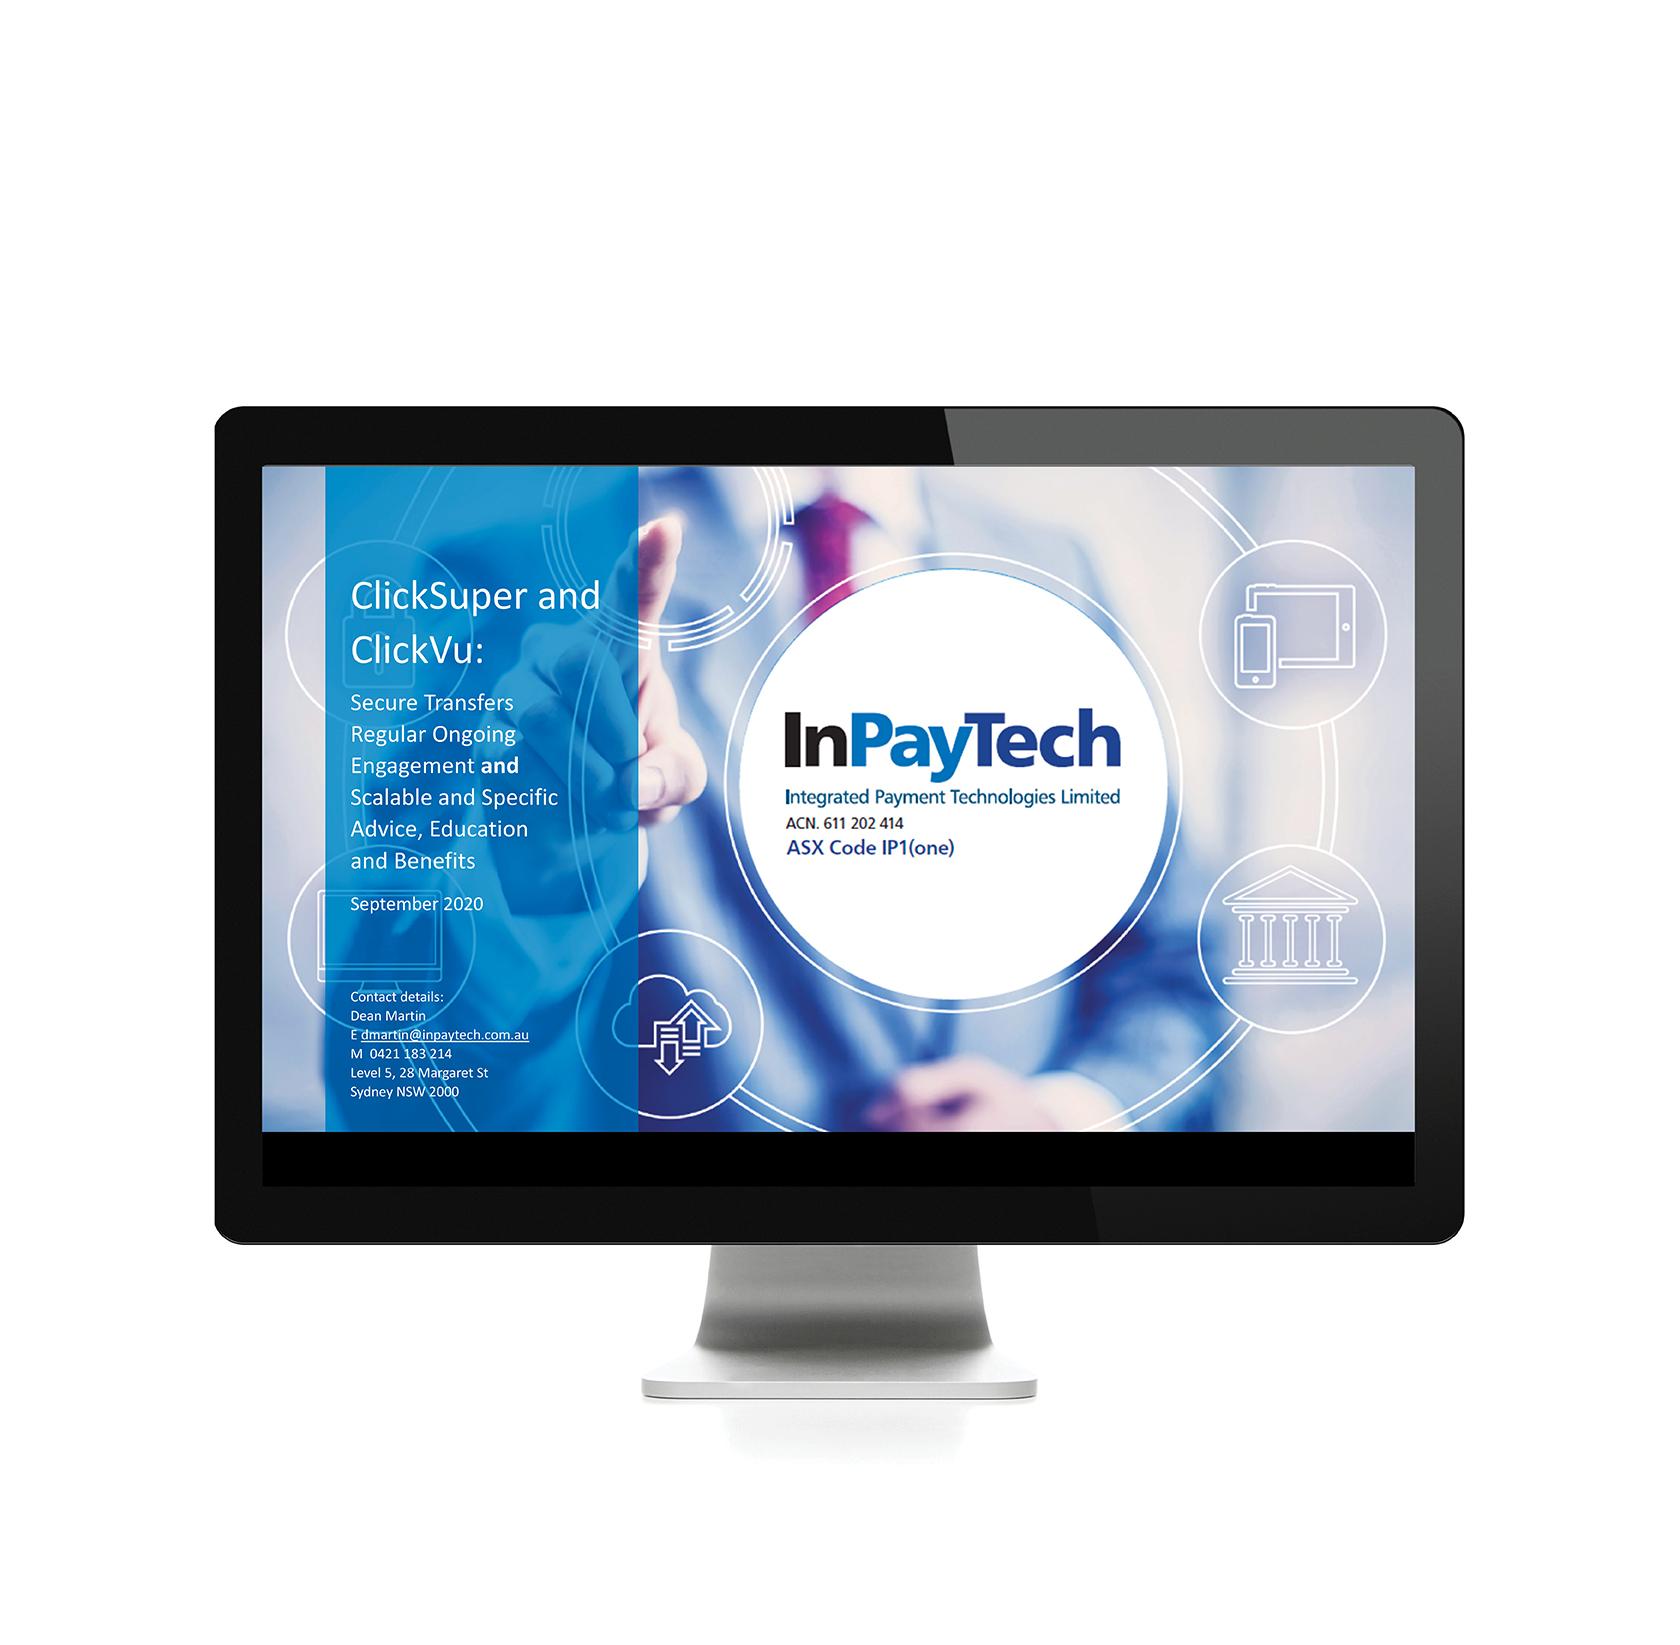 InPayTech Powerpoint presentation